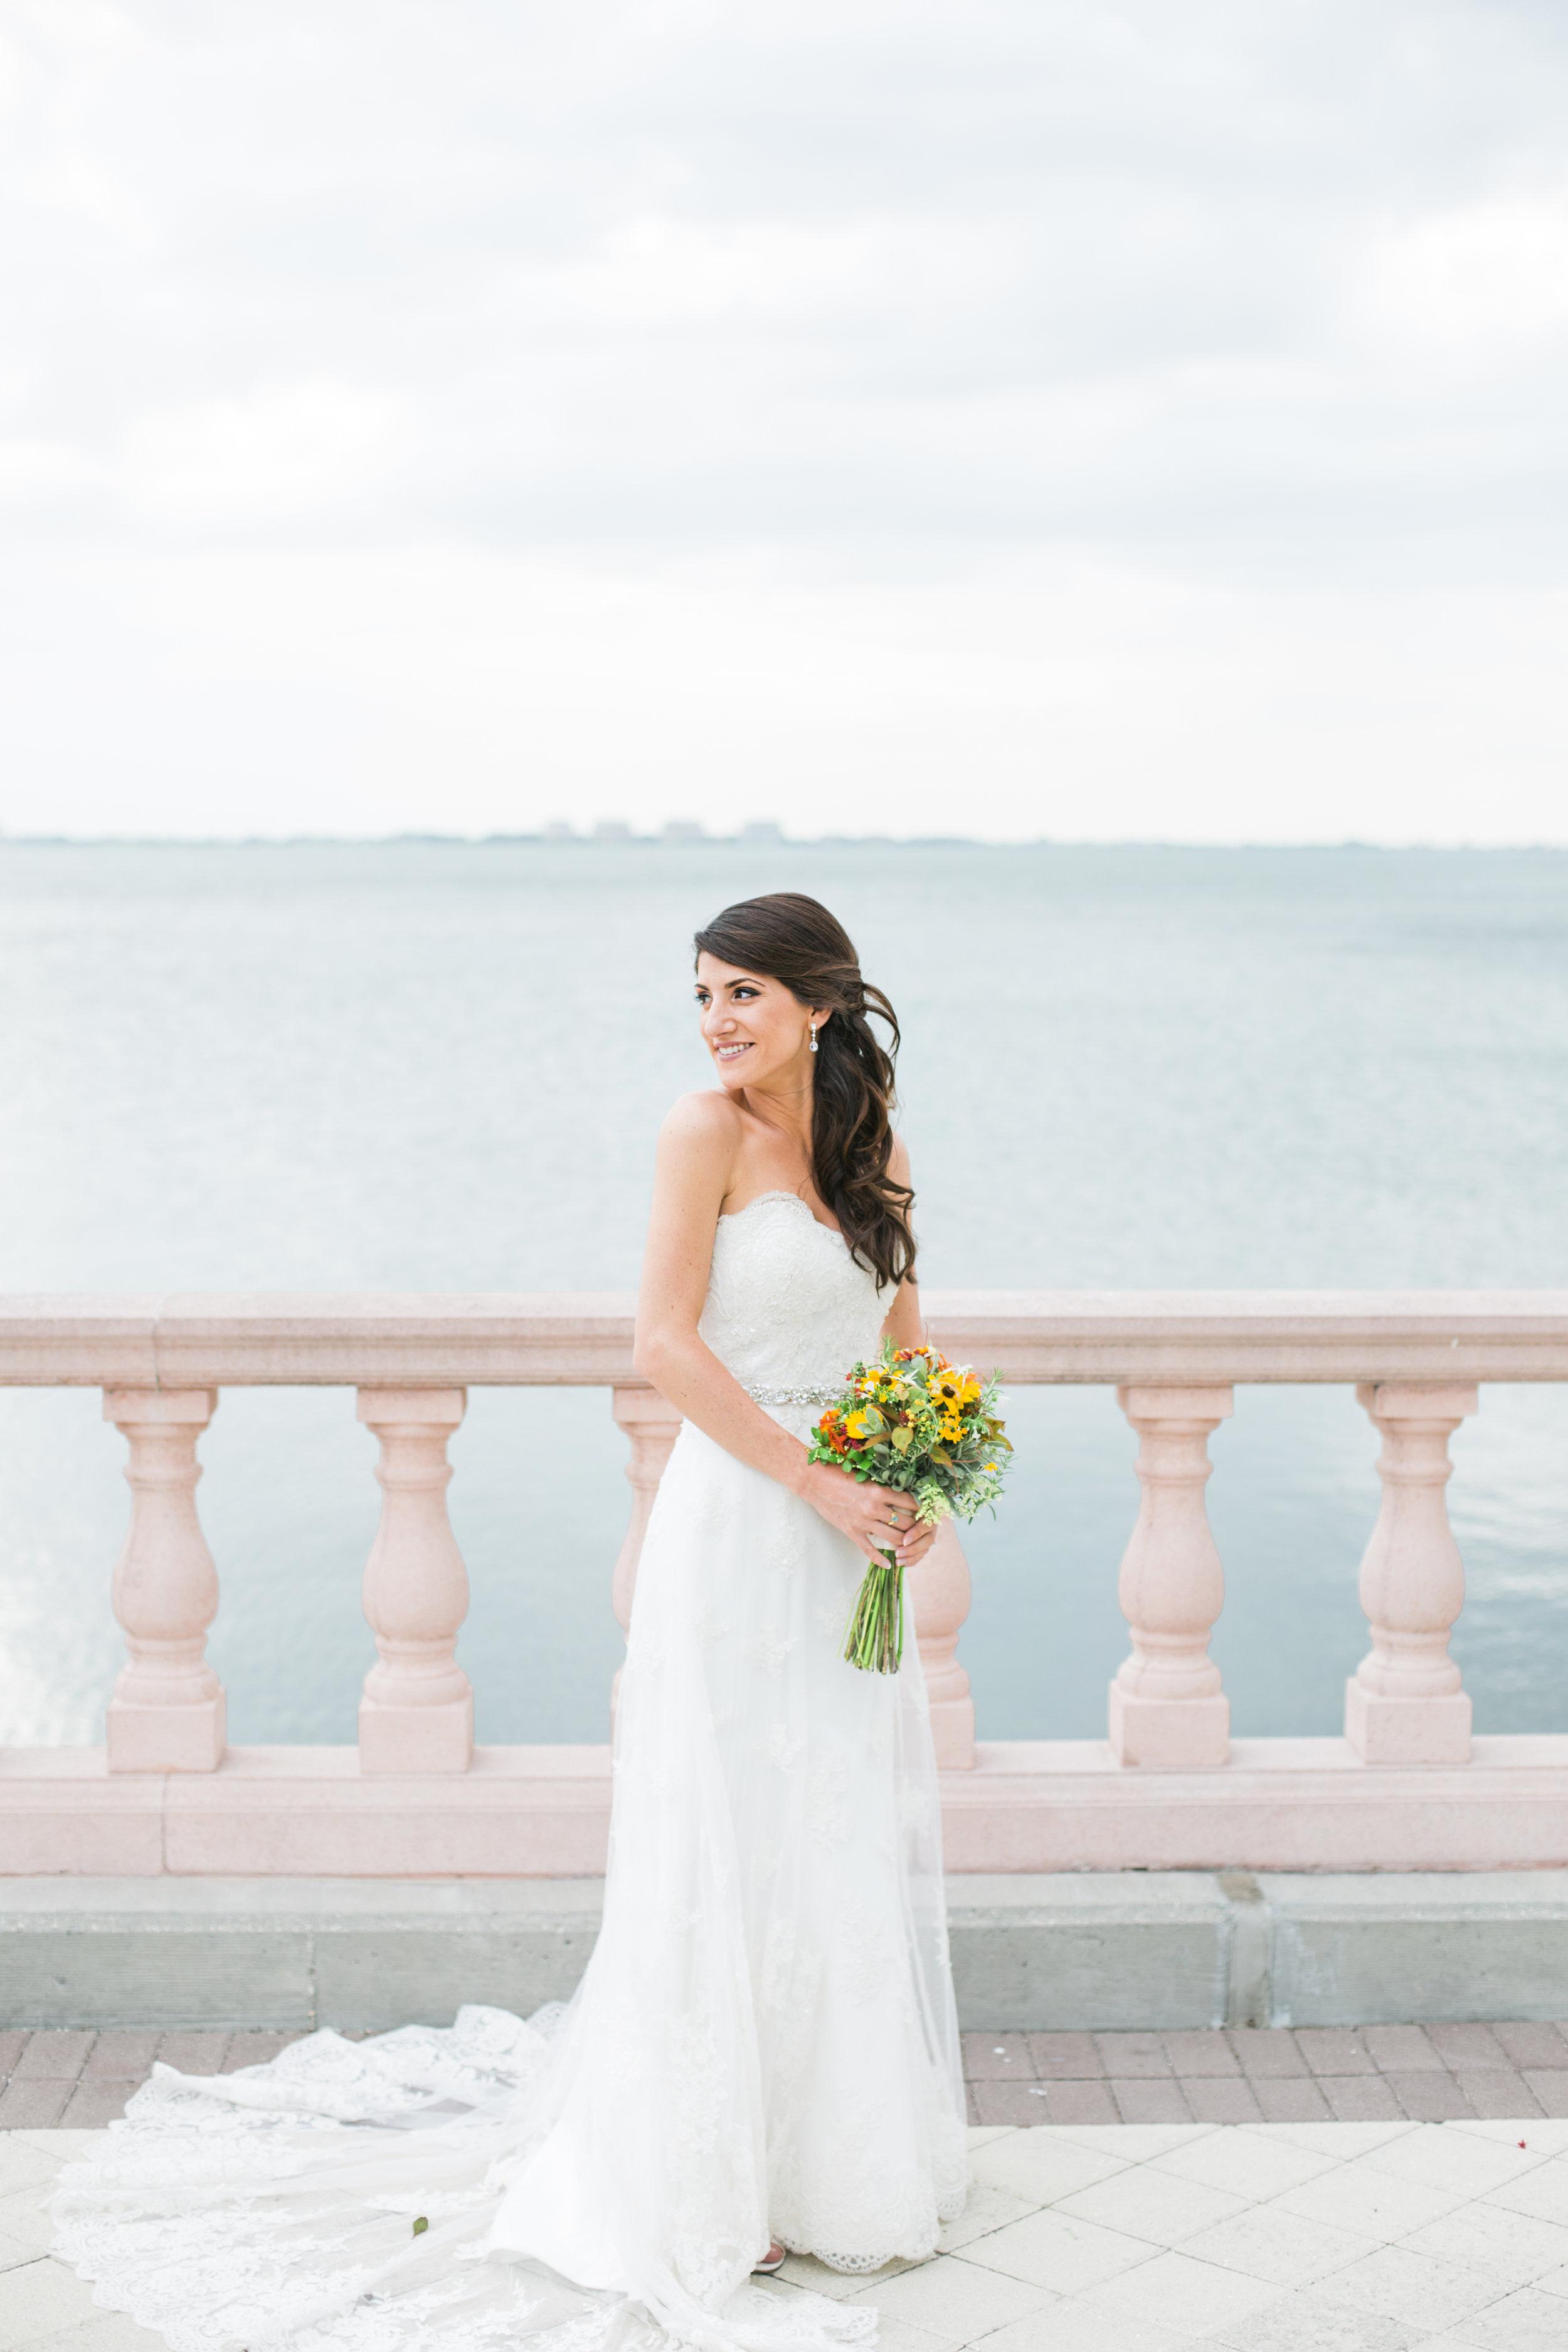 Rachel + Cole - Ringling Wedding Photography - Sarasota Wedding Photography - Emily & Co. Photography - 3. Couple (54).jpg